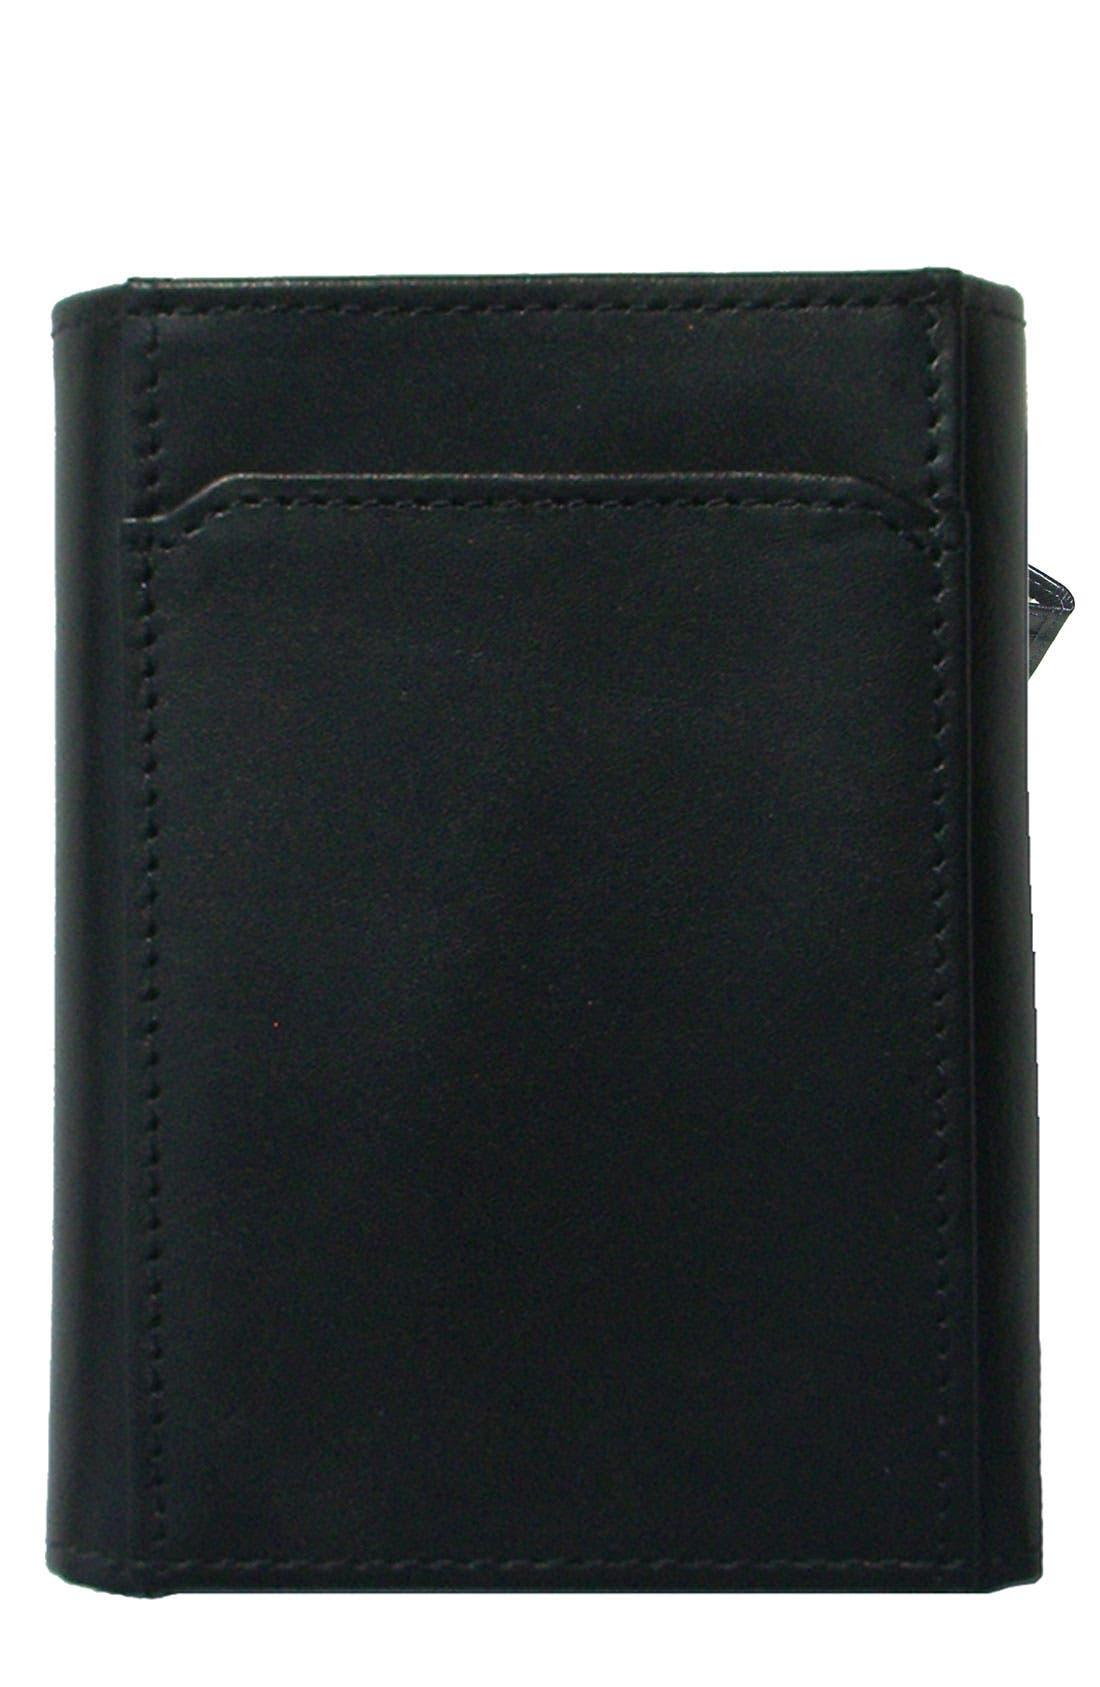 Alternate Image 1 Selected - Boconi Trifold Wallet